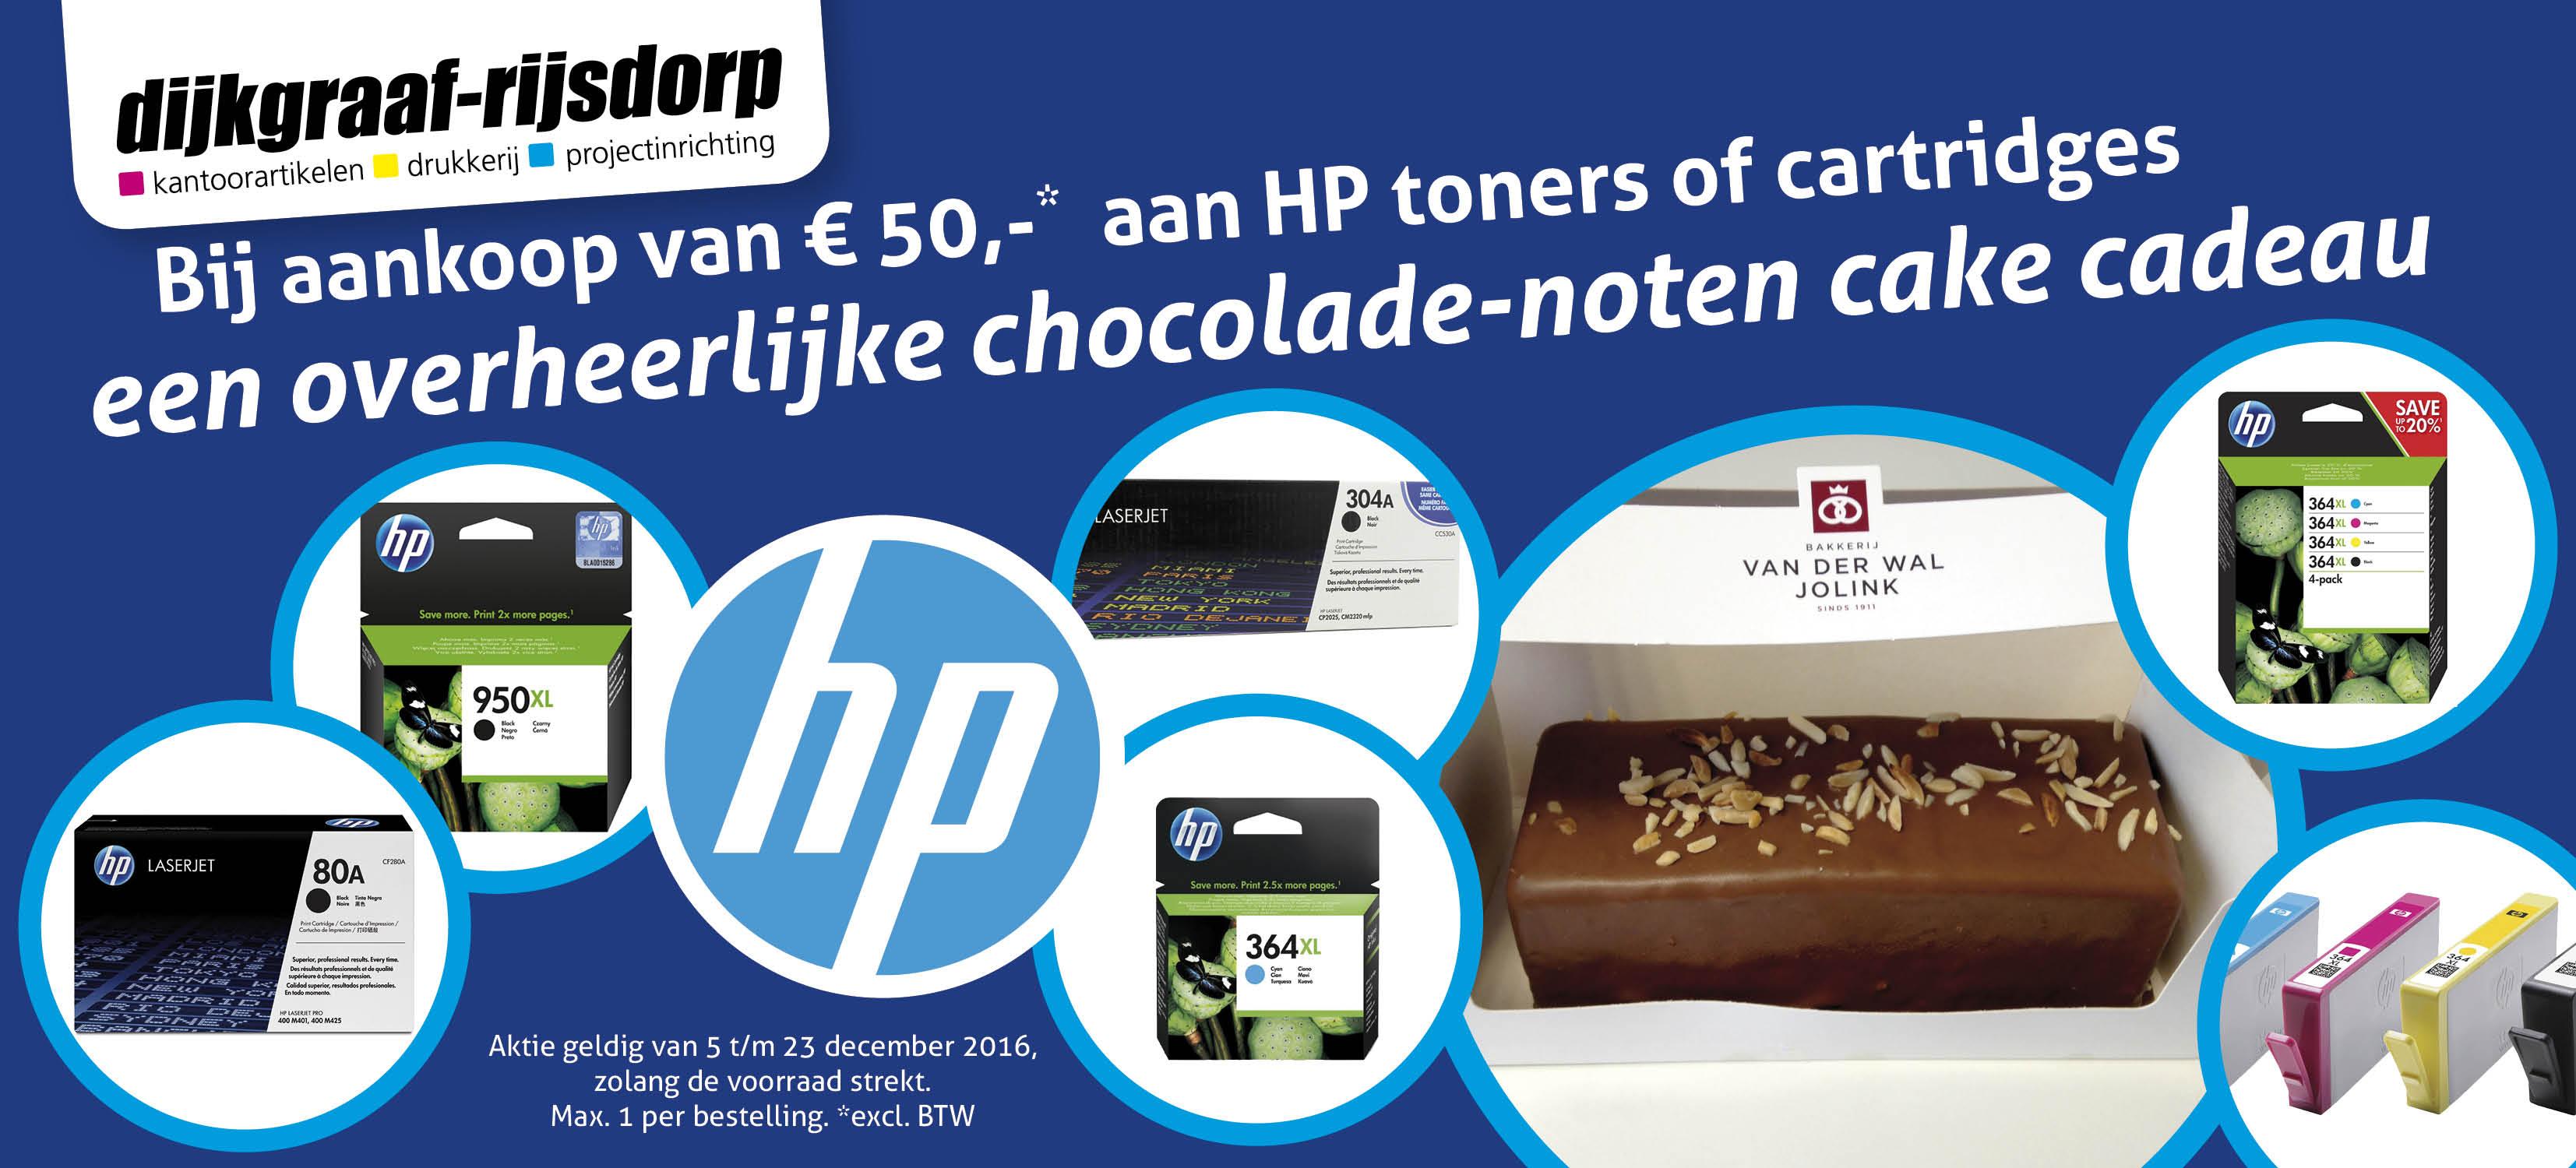 Gratis chocolade-noten cake bij HP cartridges